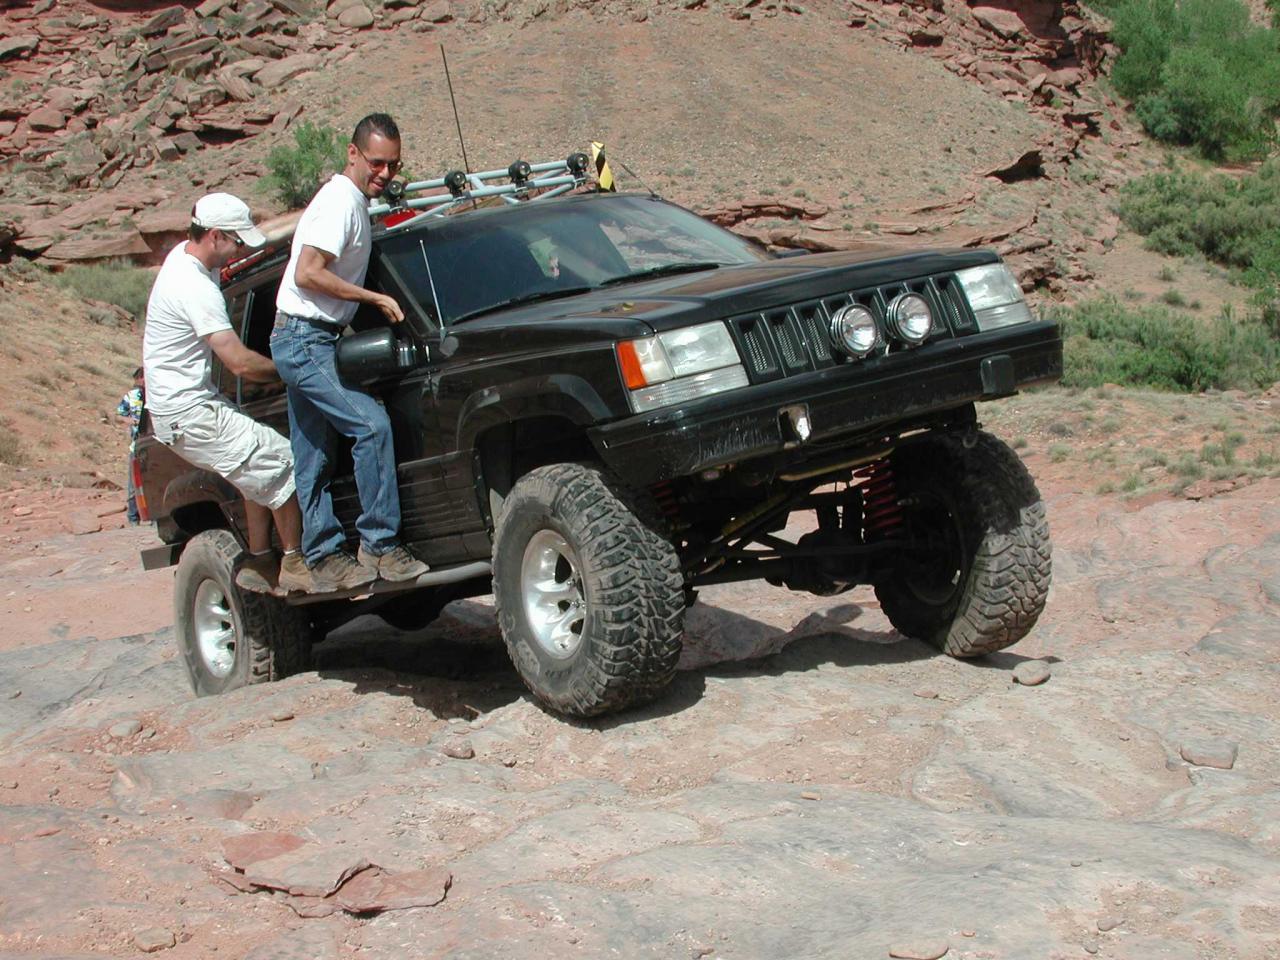 2000 Jeep Grand Cherokee Pictures C2404 also 2006 Jeep Liberty Serpentine Belt Diagram likewise Top 1999 2000 2001 2004 Jeep Grand Cherokee Kopfeinheit Auto A V Dvd Radio Gps Navigation Bluetooth Musik Tv Tuner Lenkrad Steuerung Zwei Zonen Ipod Aux T6096 further File '99 '01 Jeep Cherokee Sport as well 2011. on 2001 jeep grand cherokee